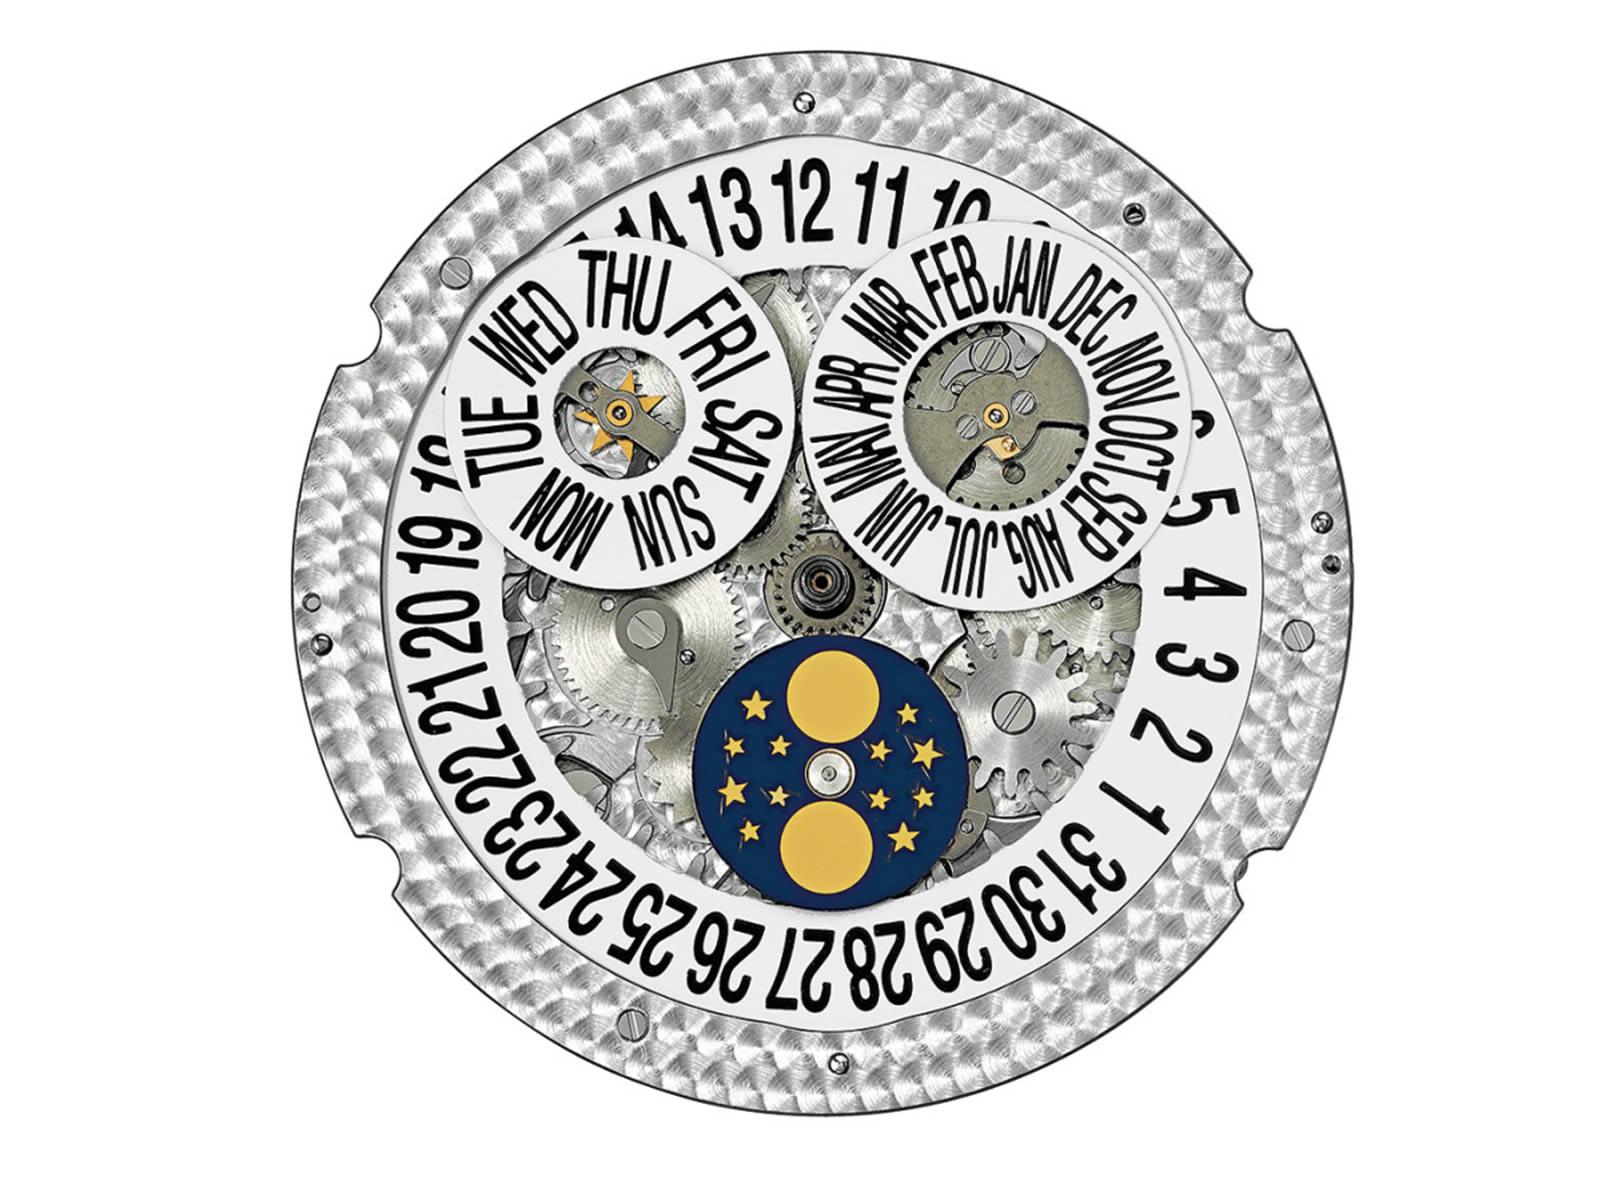 5205g-patek-philippe-annual-calendar-moon-phase-4-.jpg